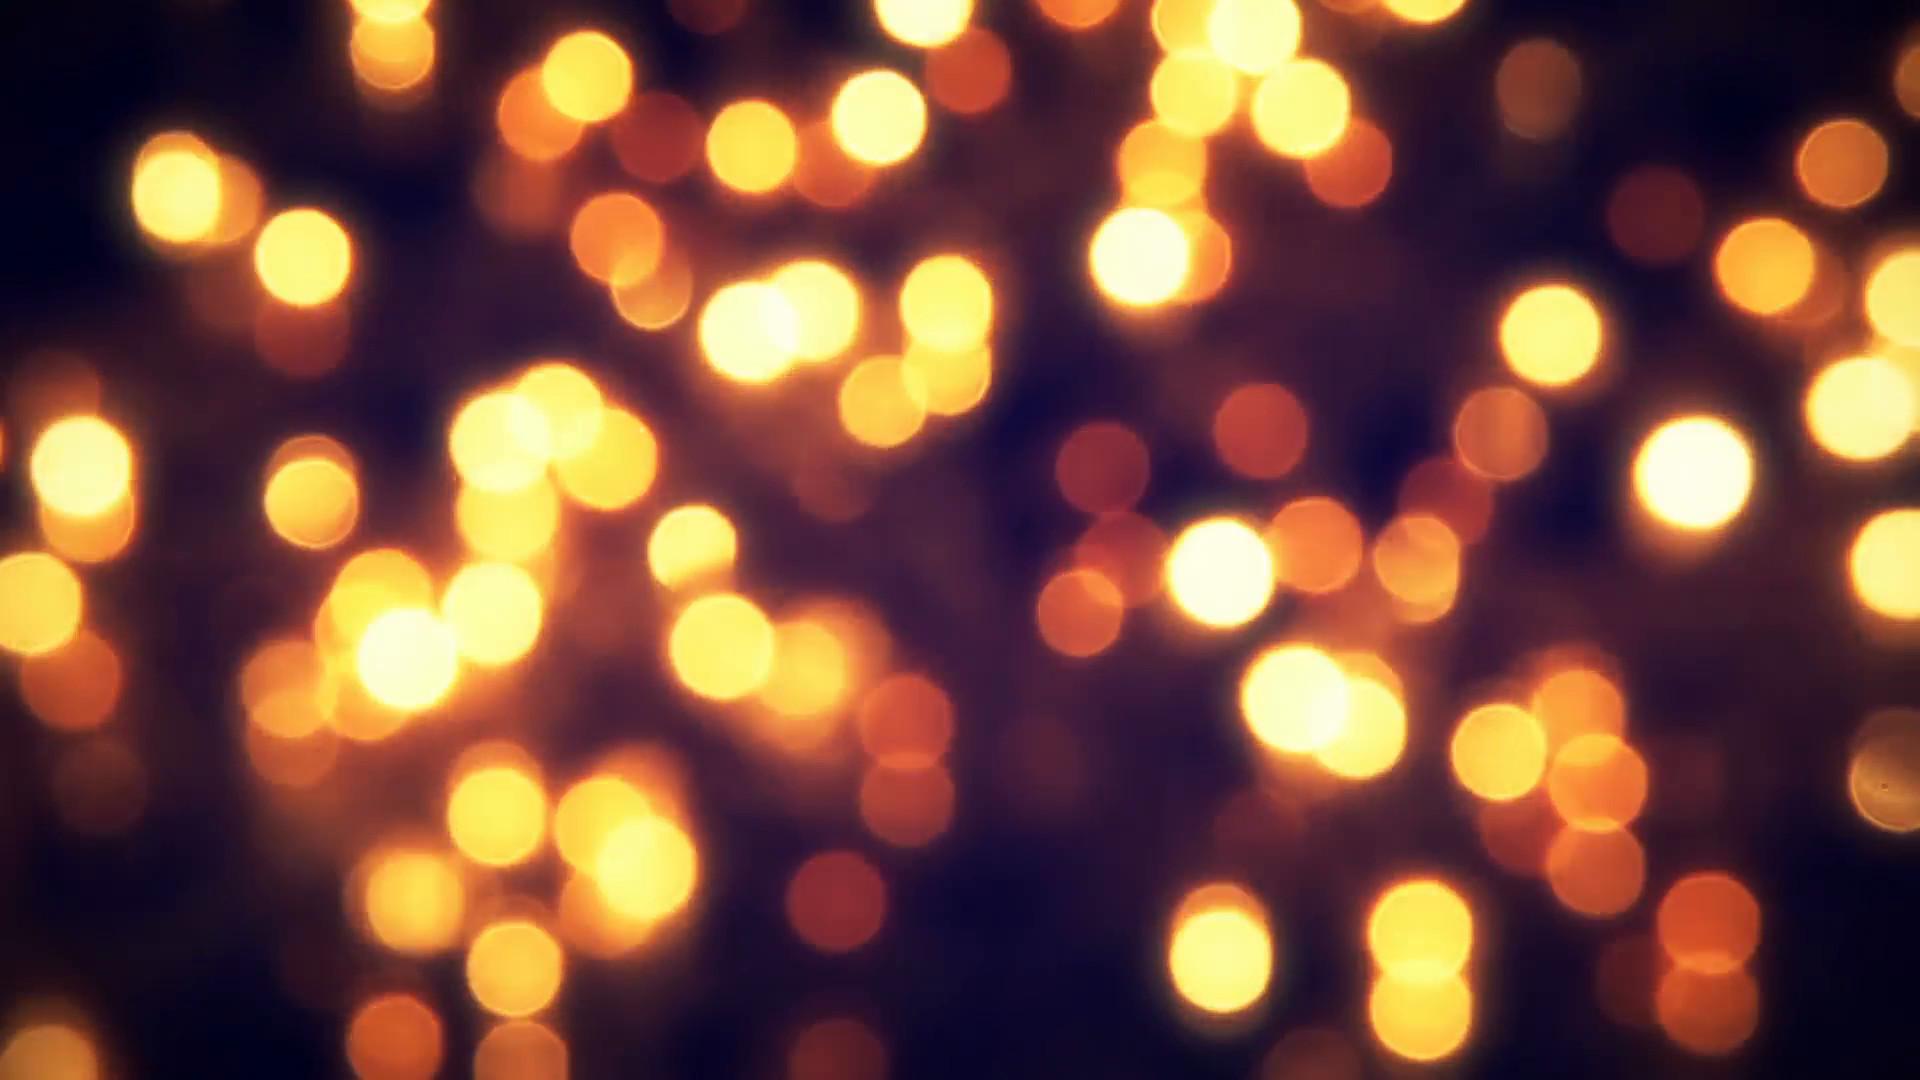 Christmas Lights Background.Christmas Lights Background 42 Images